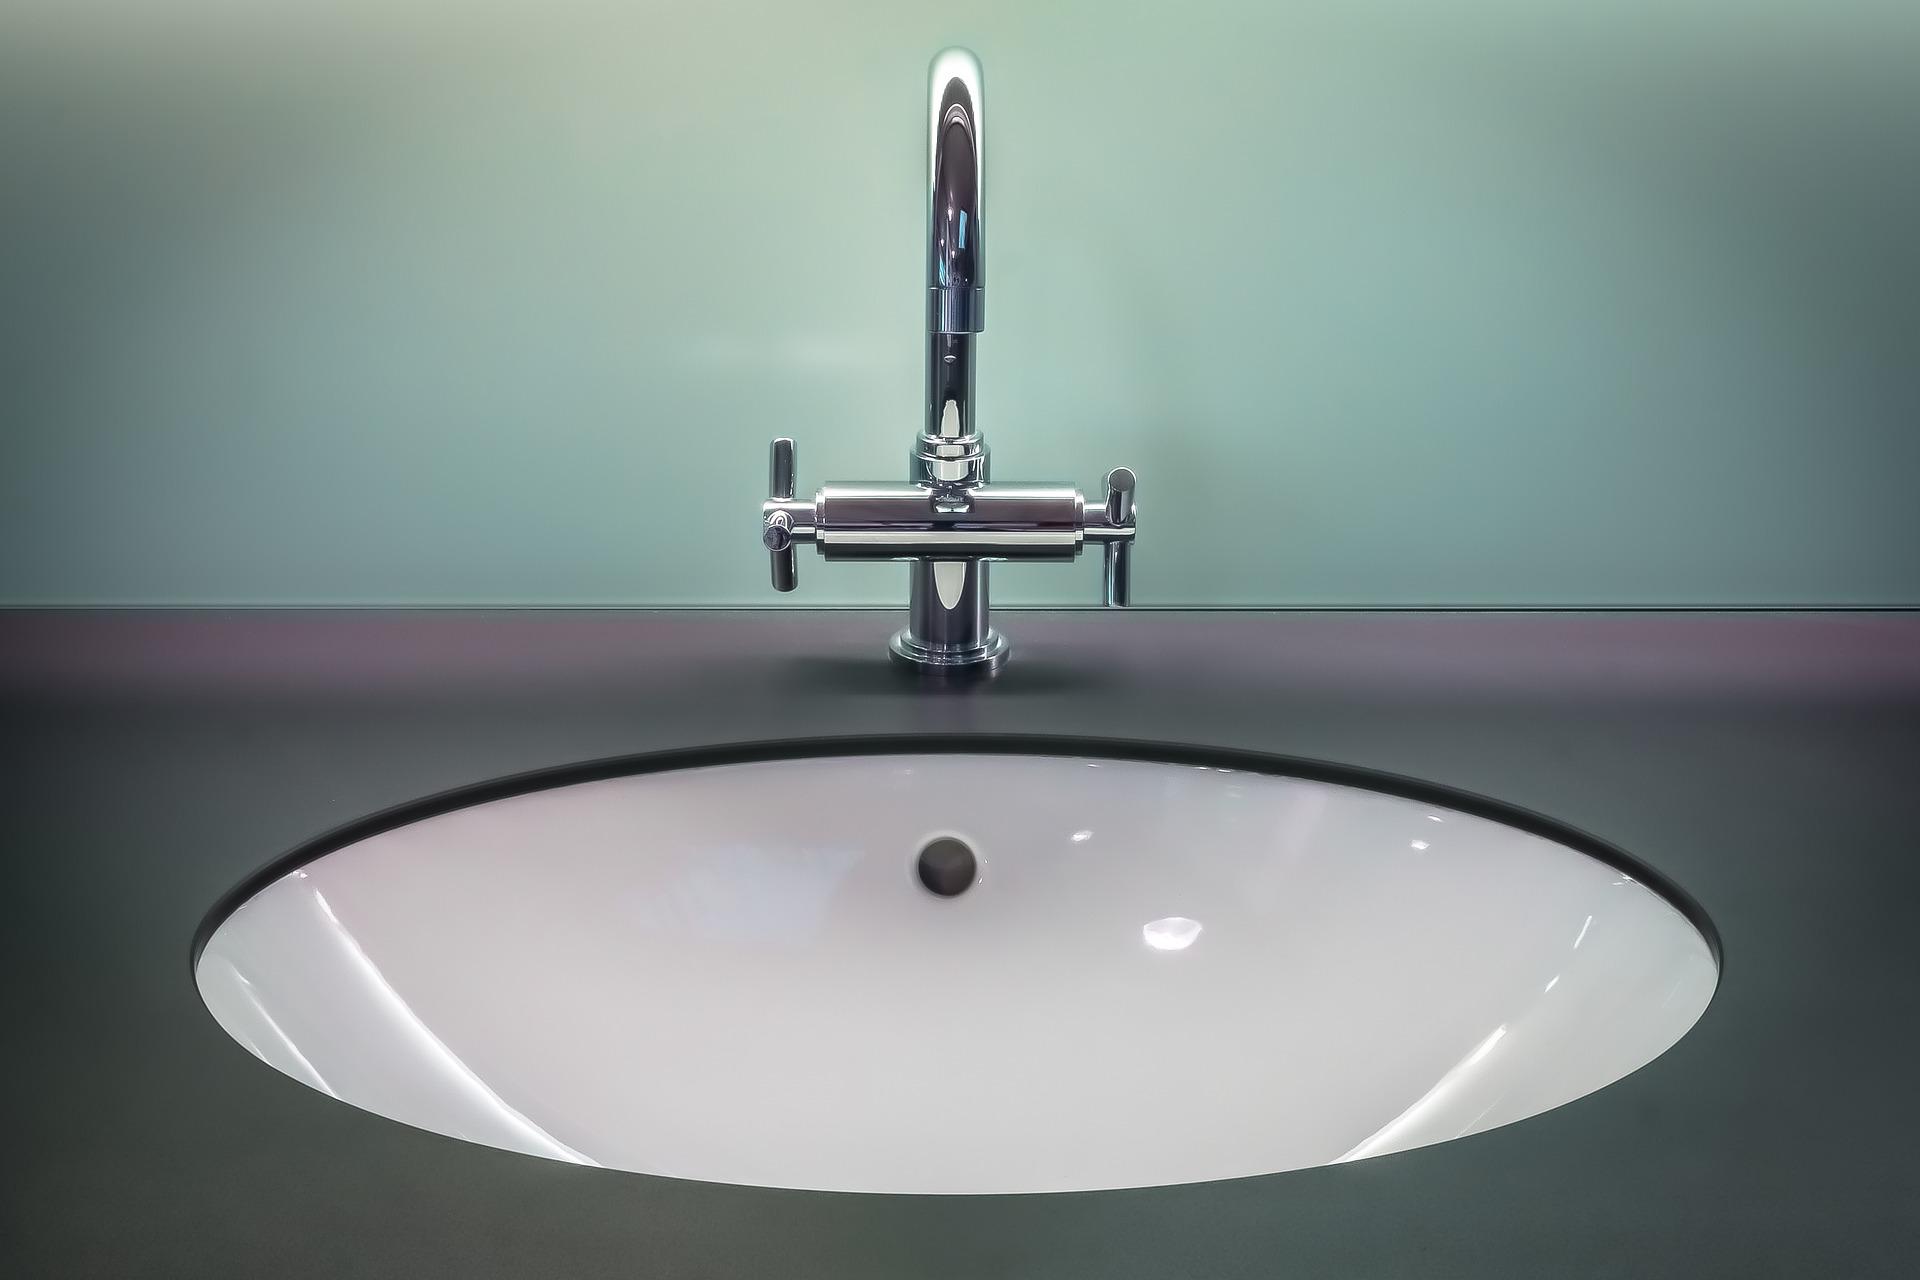 5 Tips for Renters on Bathroom Maintenance